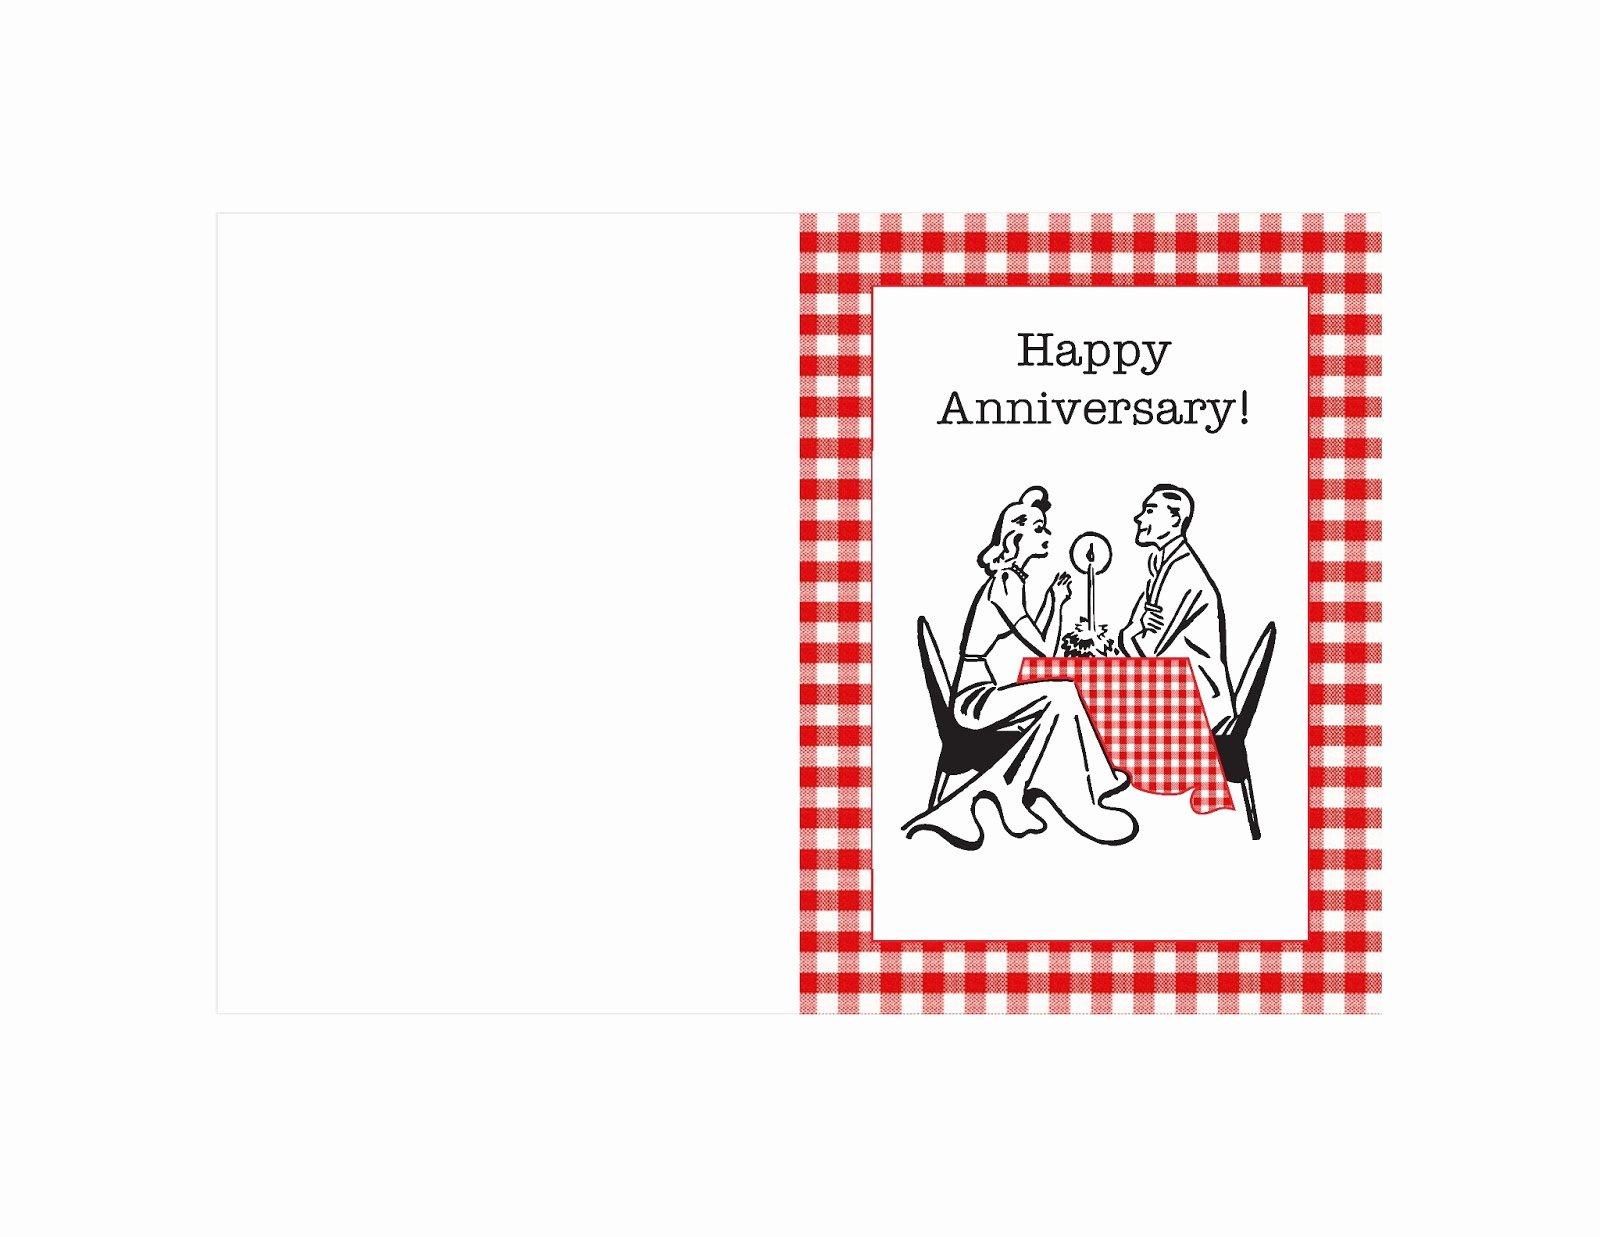 Free Printable Wedding Cards Fresh Twocreativewomen Free Wedding Anniversary Card Printables